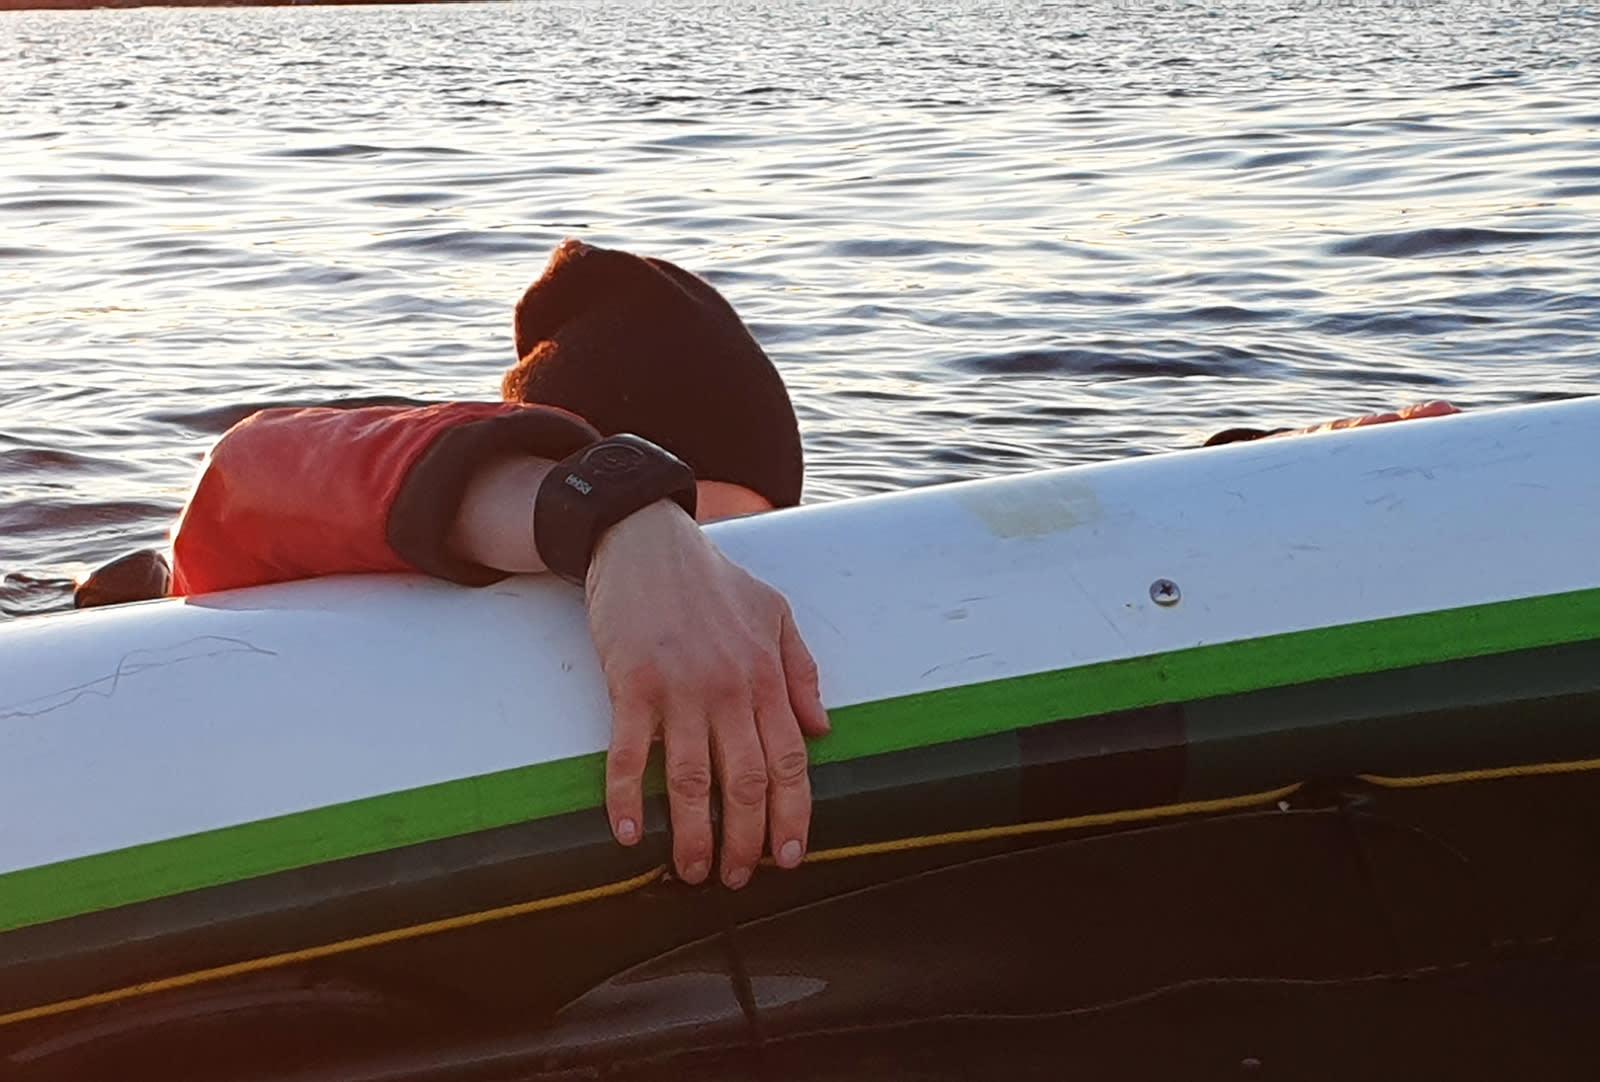 HØSTENS FINESTE ACCESSOIR: Padlearmbåndet med nødknapp er på størrelse med en klokke. Foto: Laila Johanne Reigstad